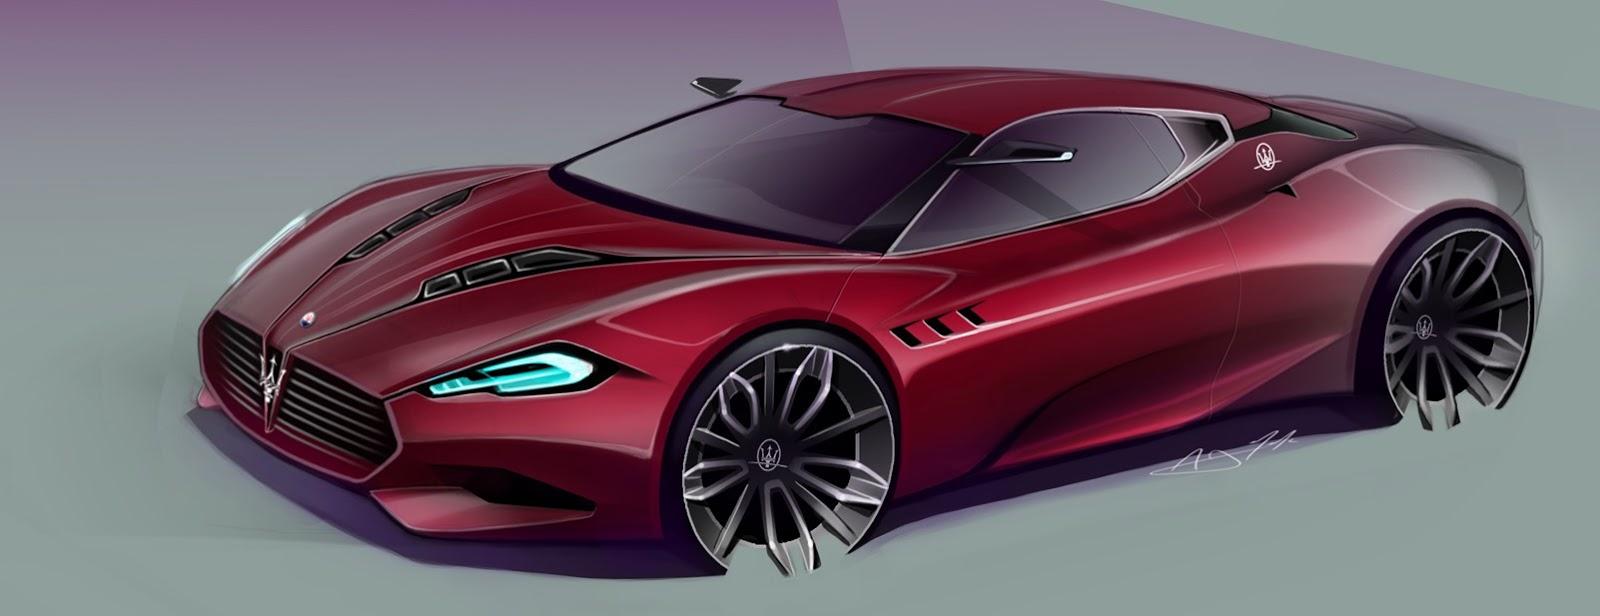 Maserati Grancorsa Could Be The Trident S Next Sportscar